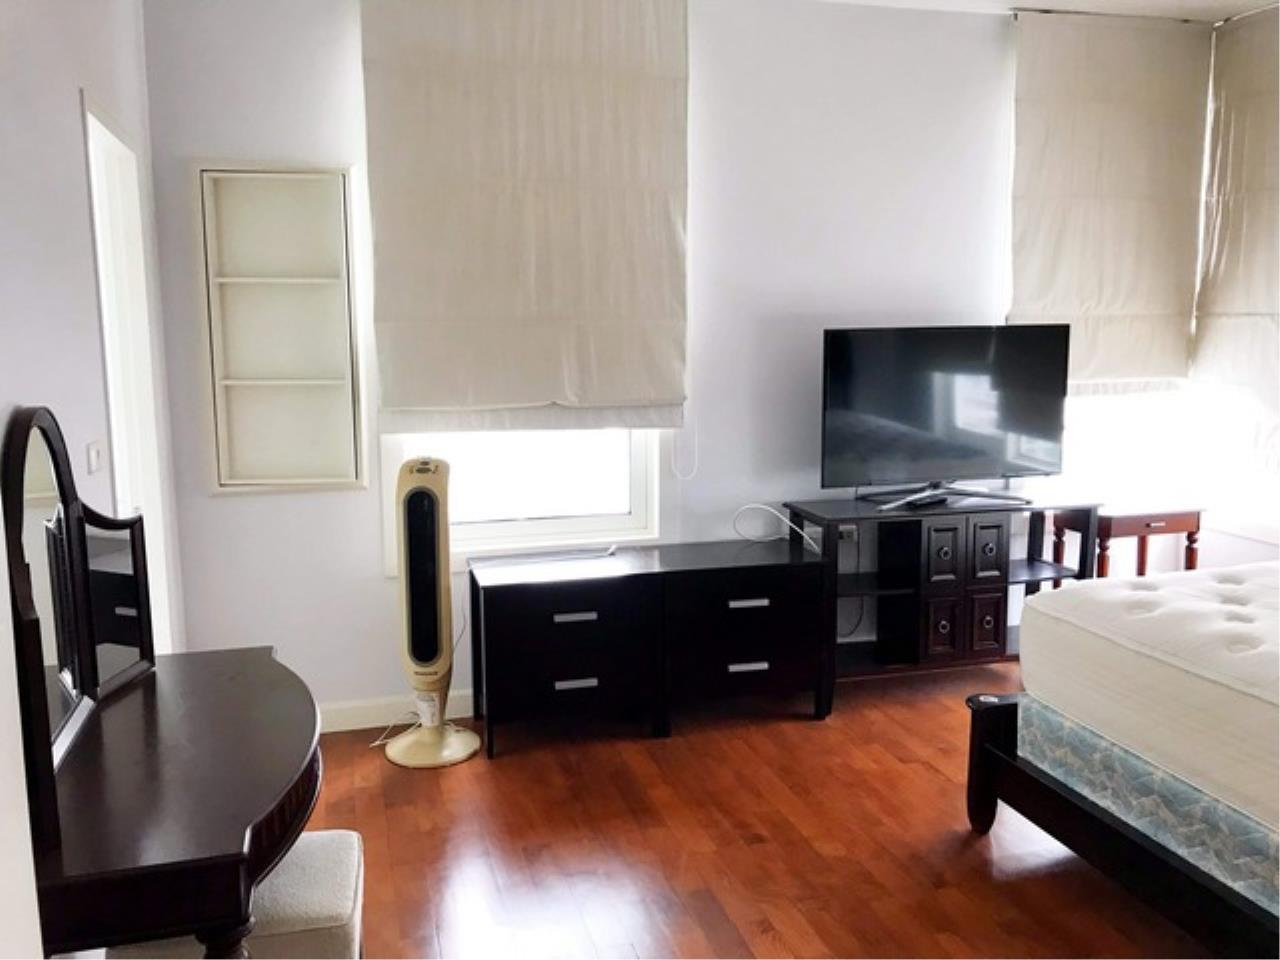 Ta (+66 9 5935 1592) Agency's SALE Condo Siri Residence by Sansiri 2 Bed near BTS Prompong Thonglor Emporium Best Price (163,000B/sqm) 5